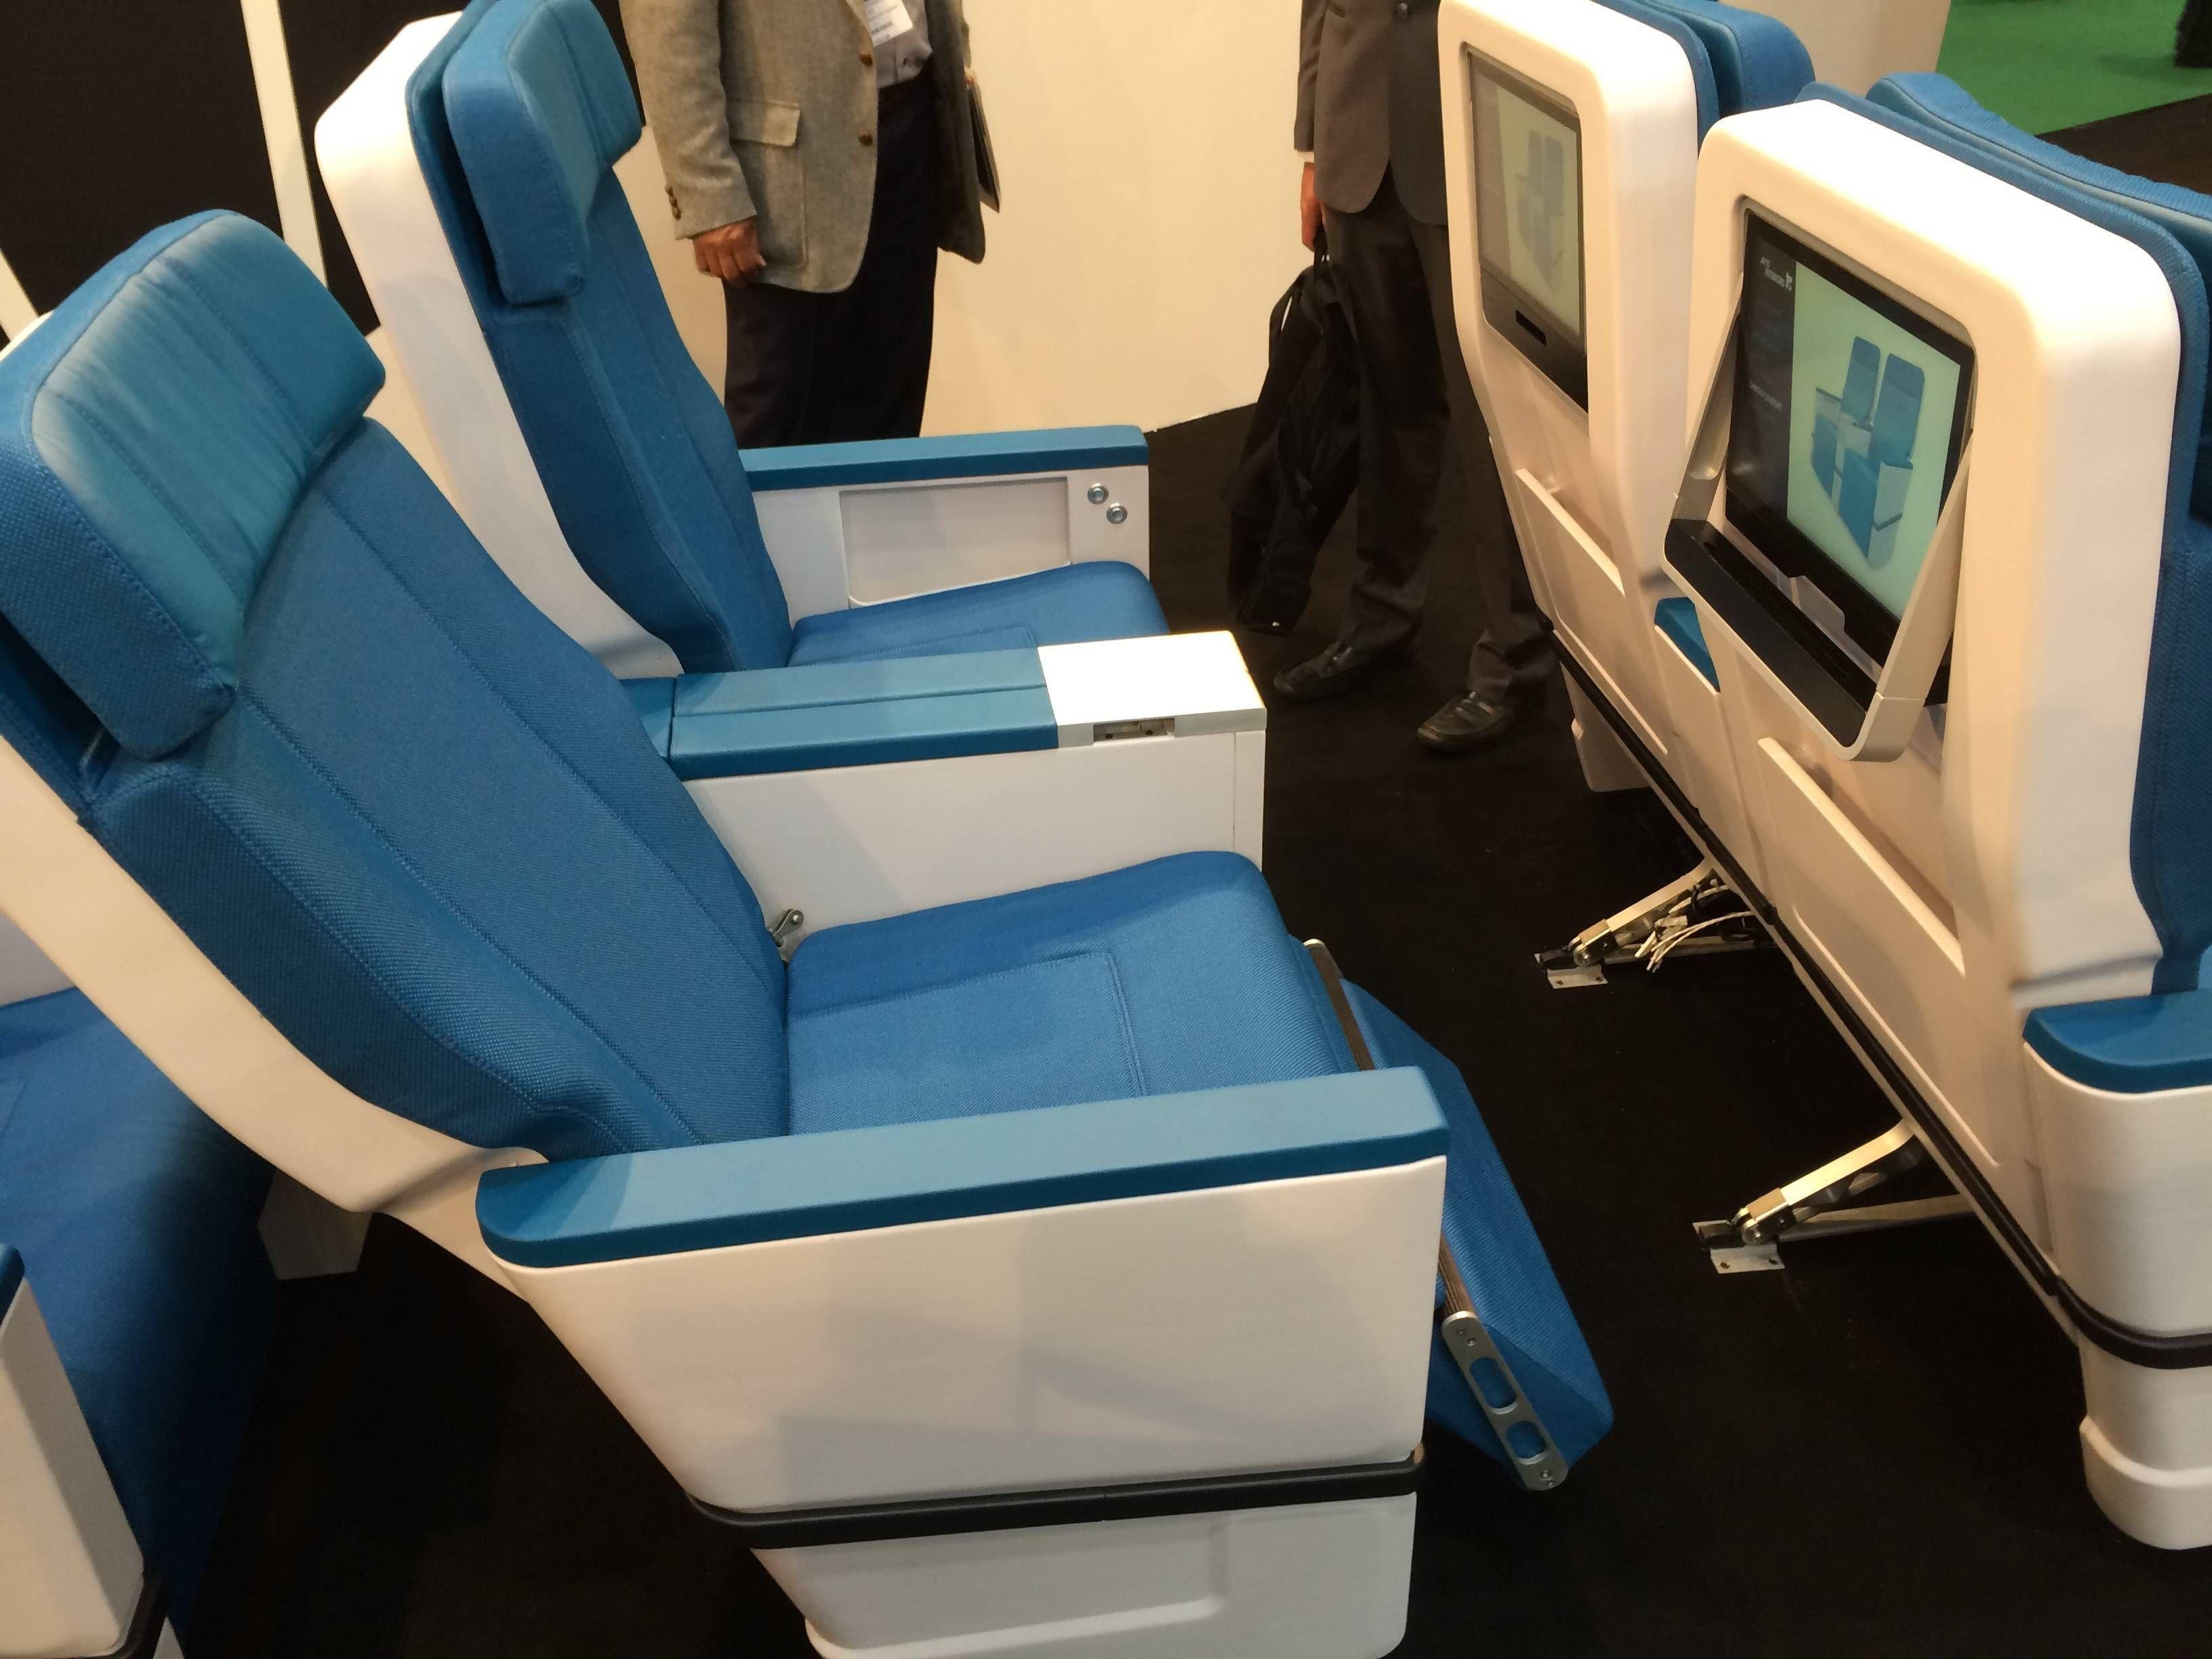 aix2014 - passageirodeprimeira aircraft interior expo